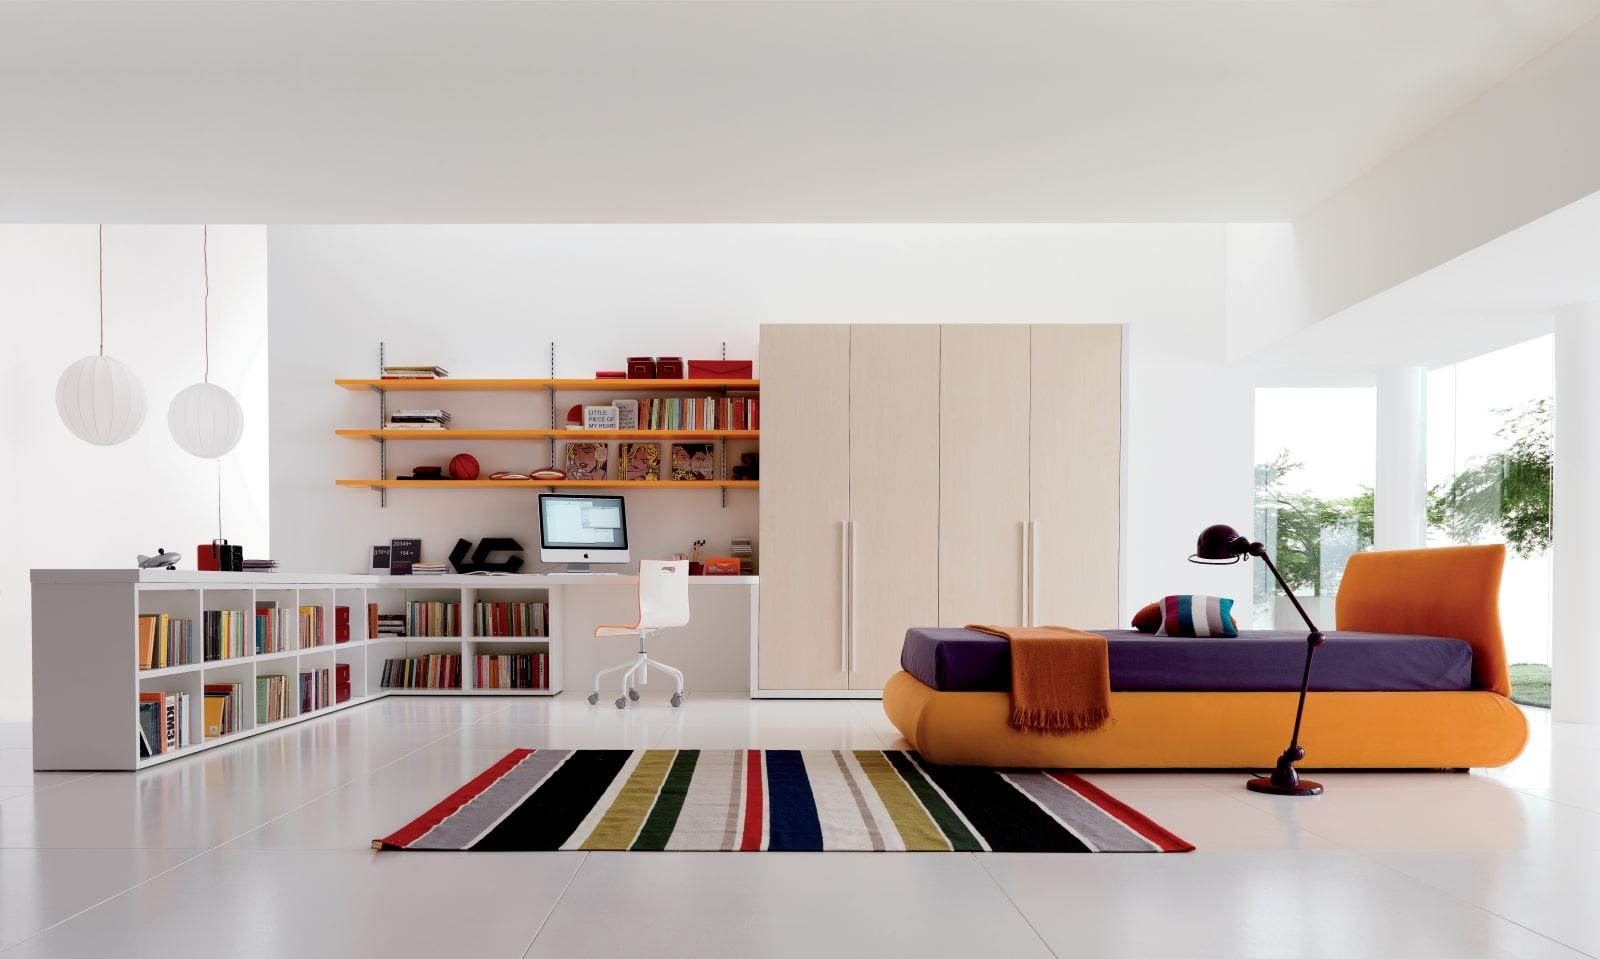 Inspirasi layout kamar dengan ukuran luas